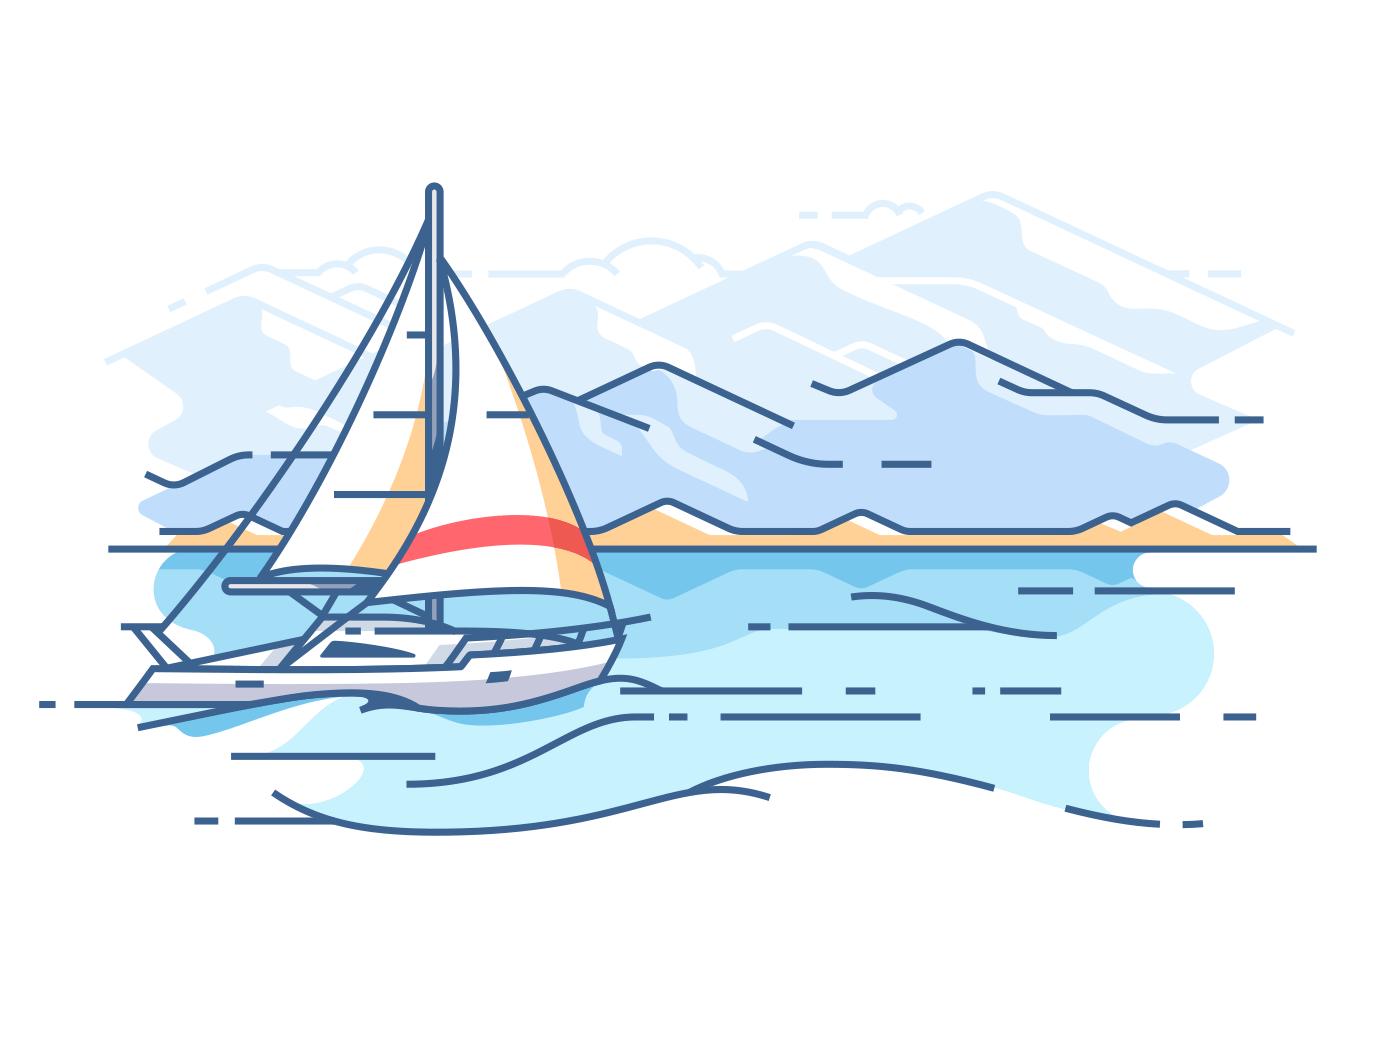 Sailing yacht in sea. Boat trip on ocean. Vector illustration